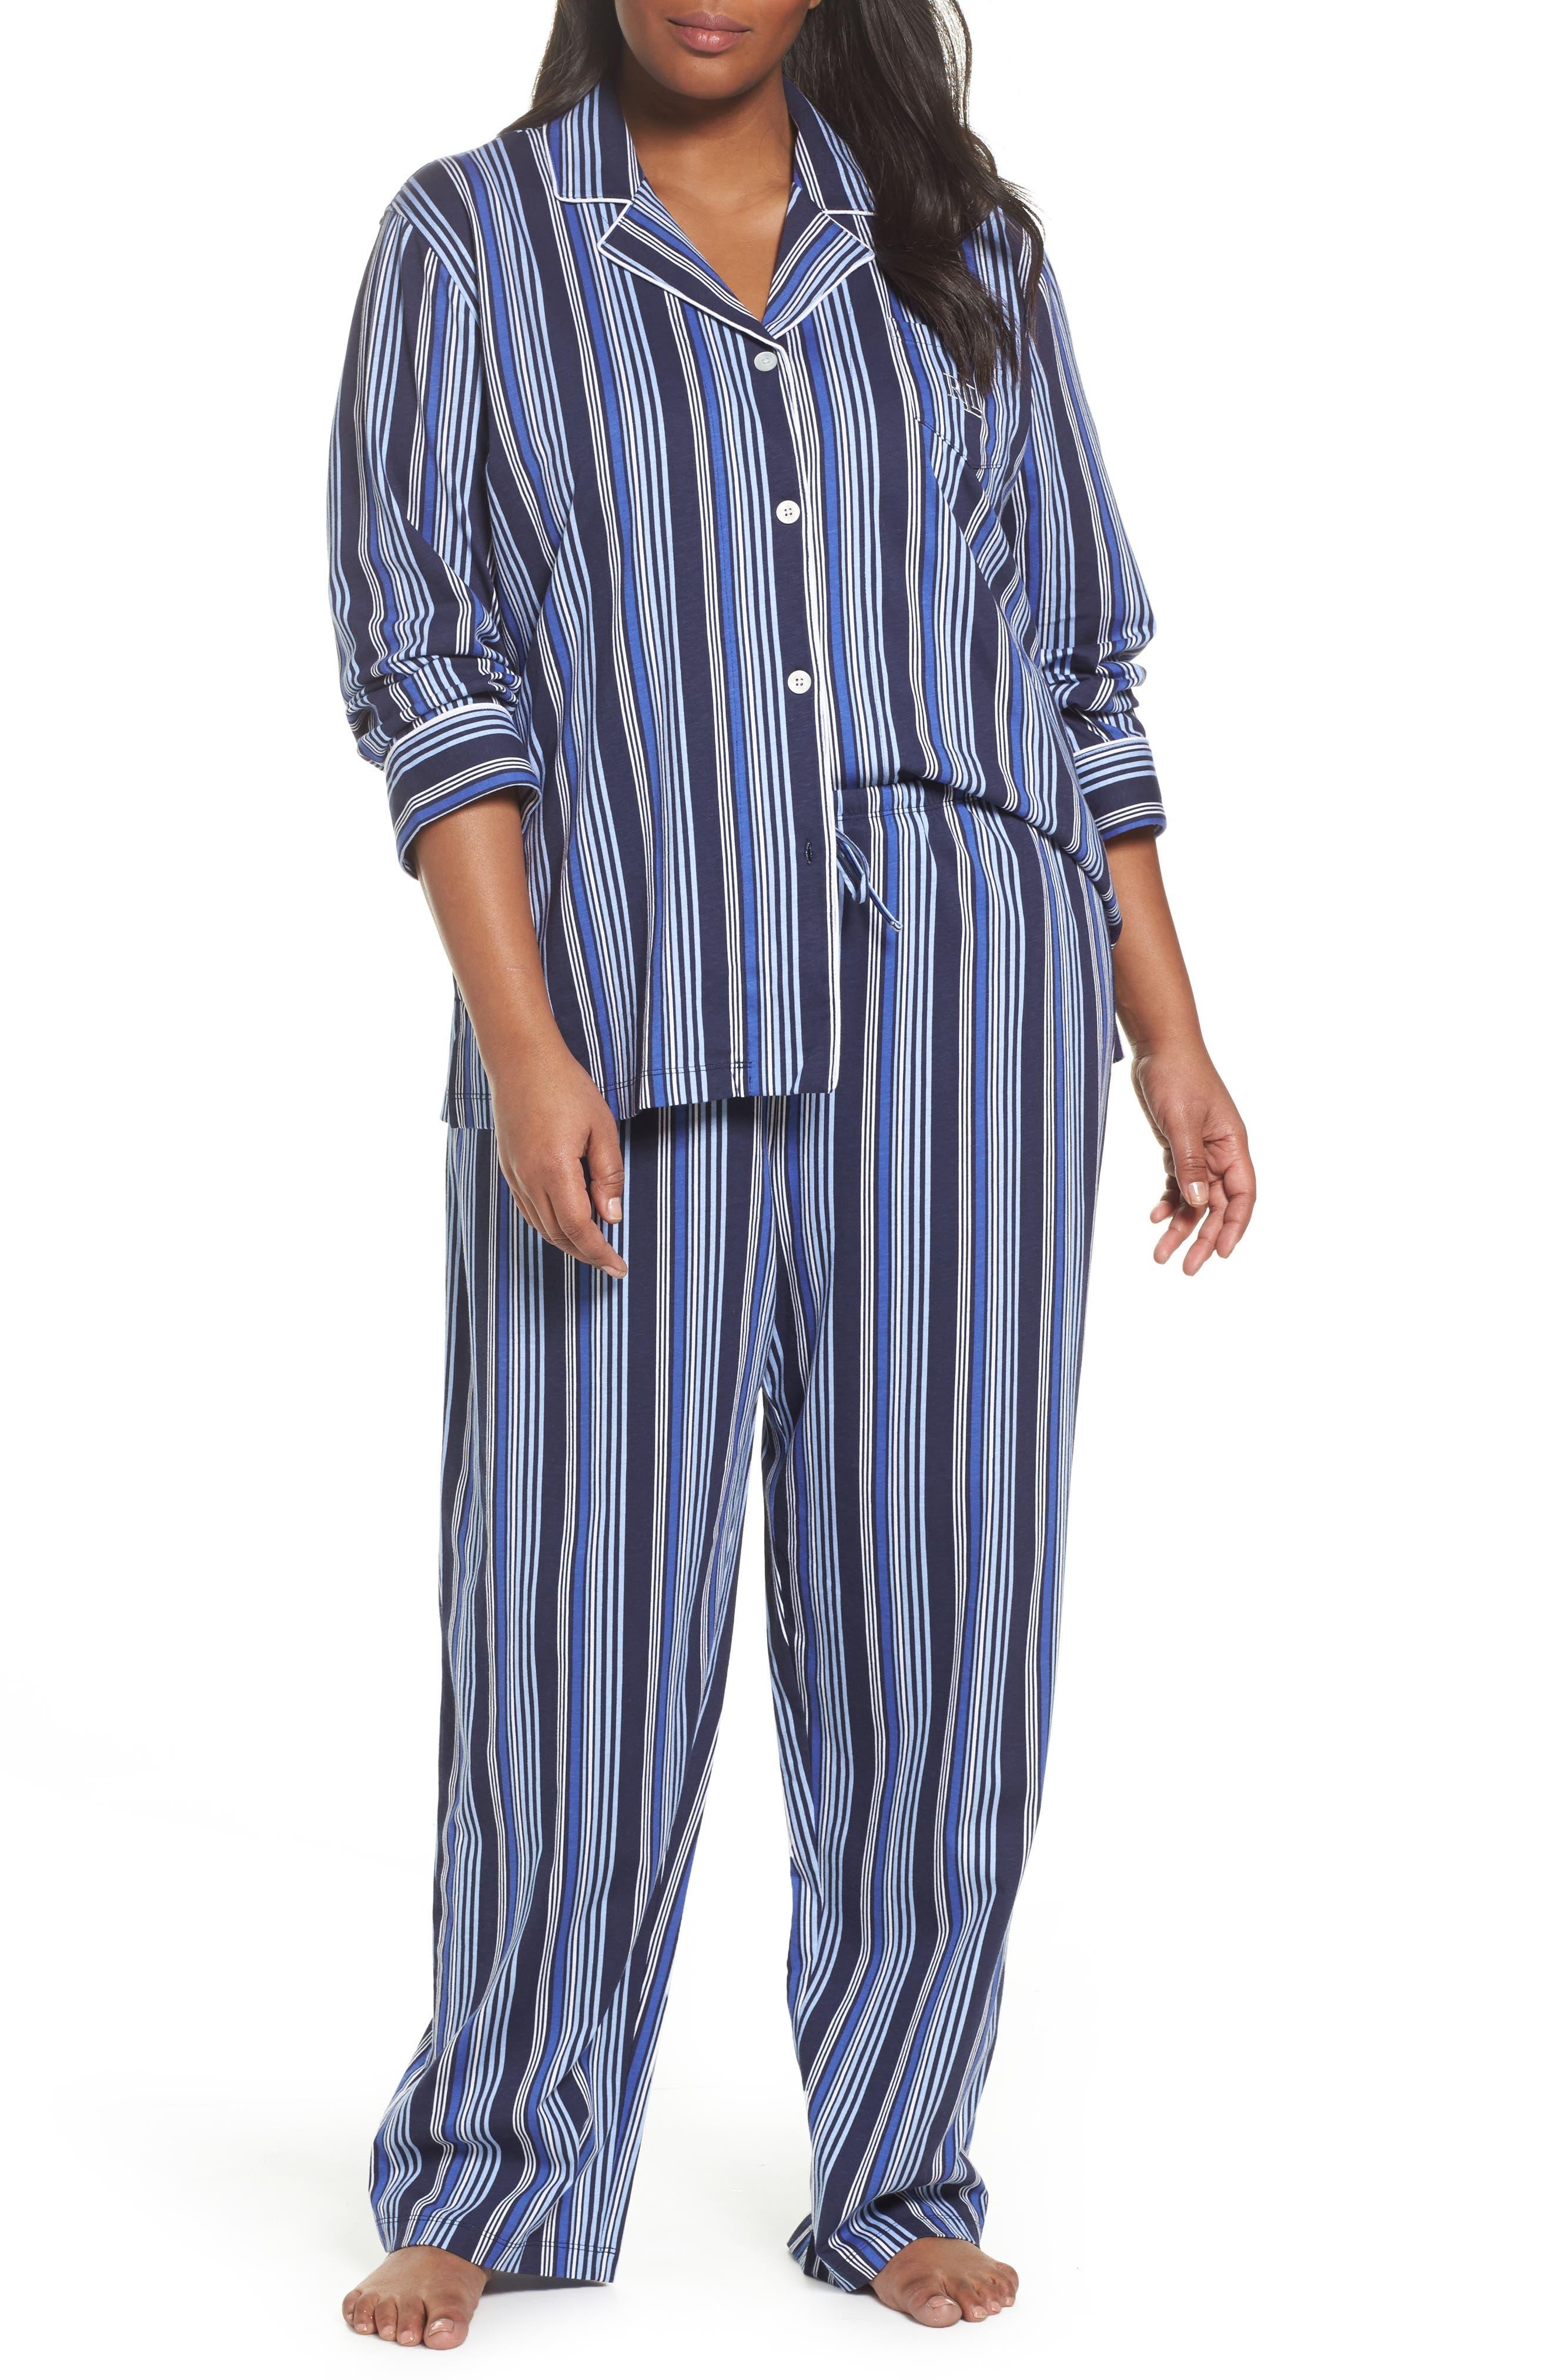 Stripe Pajamas,                             Main thumbnail 1, color,                             486